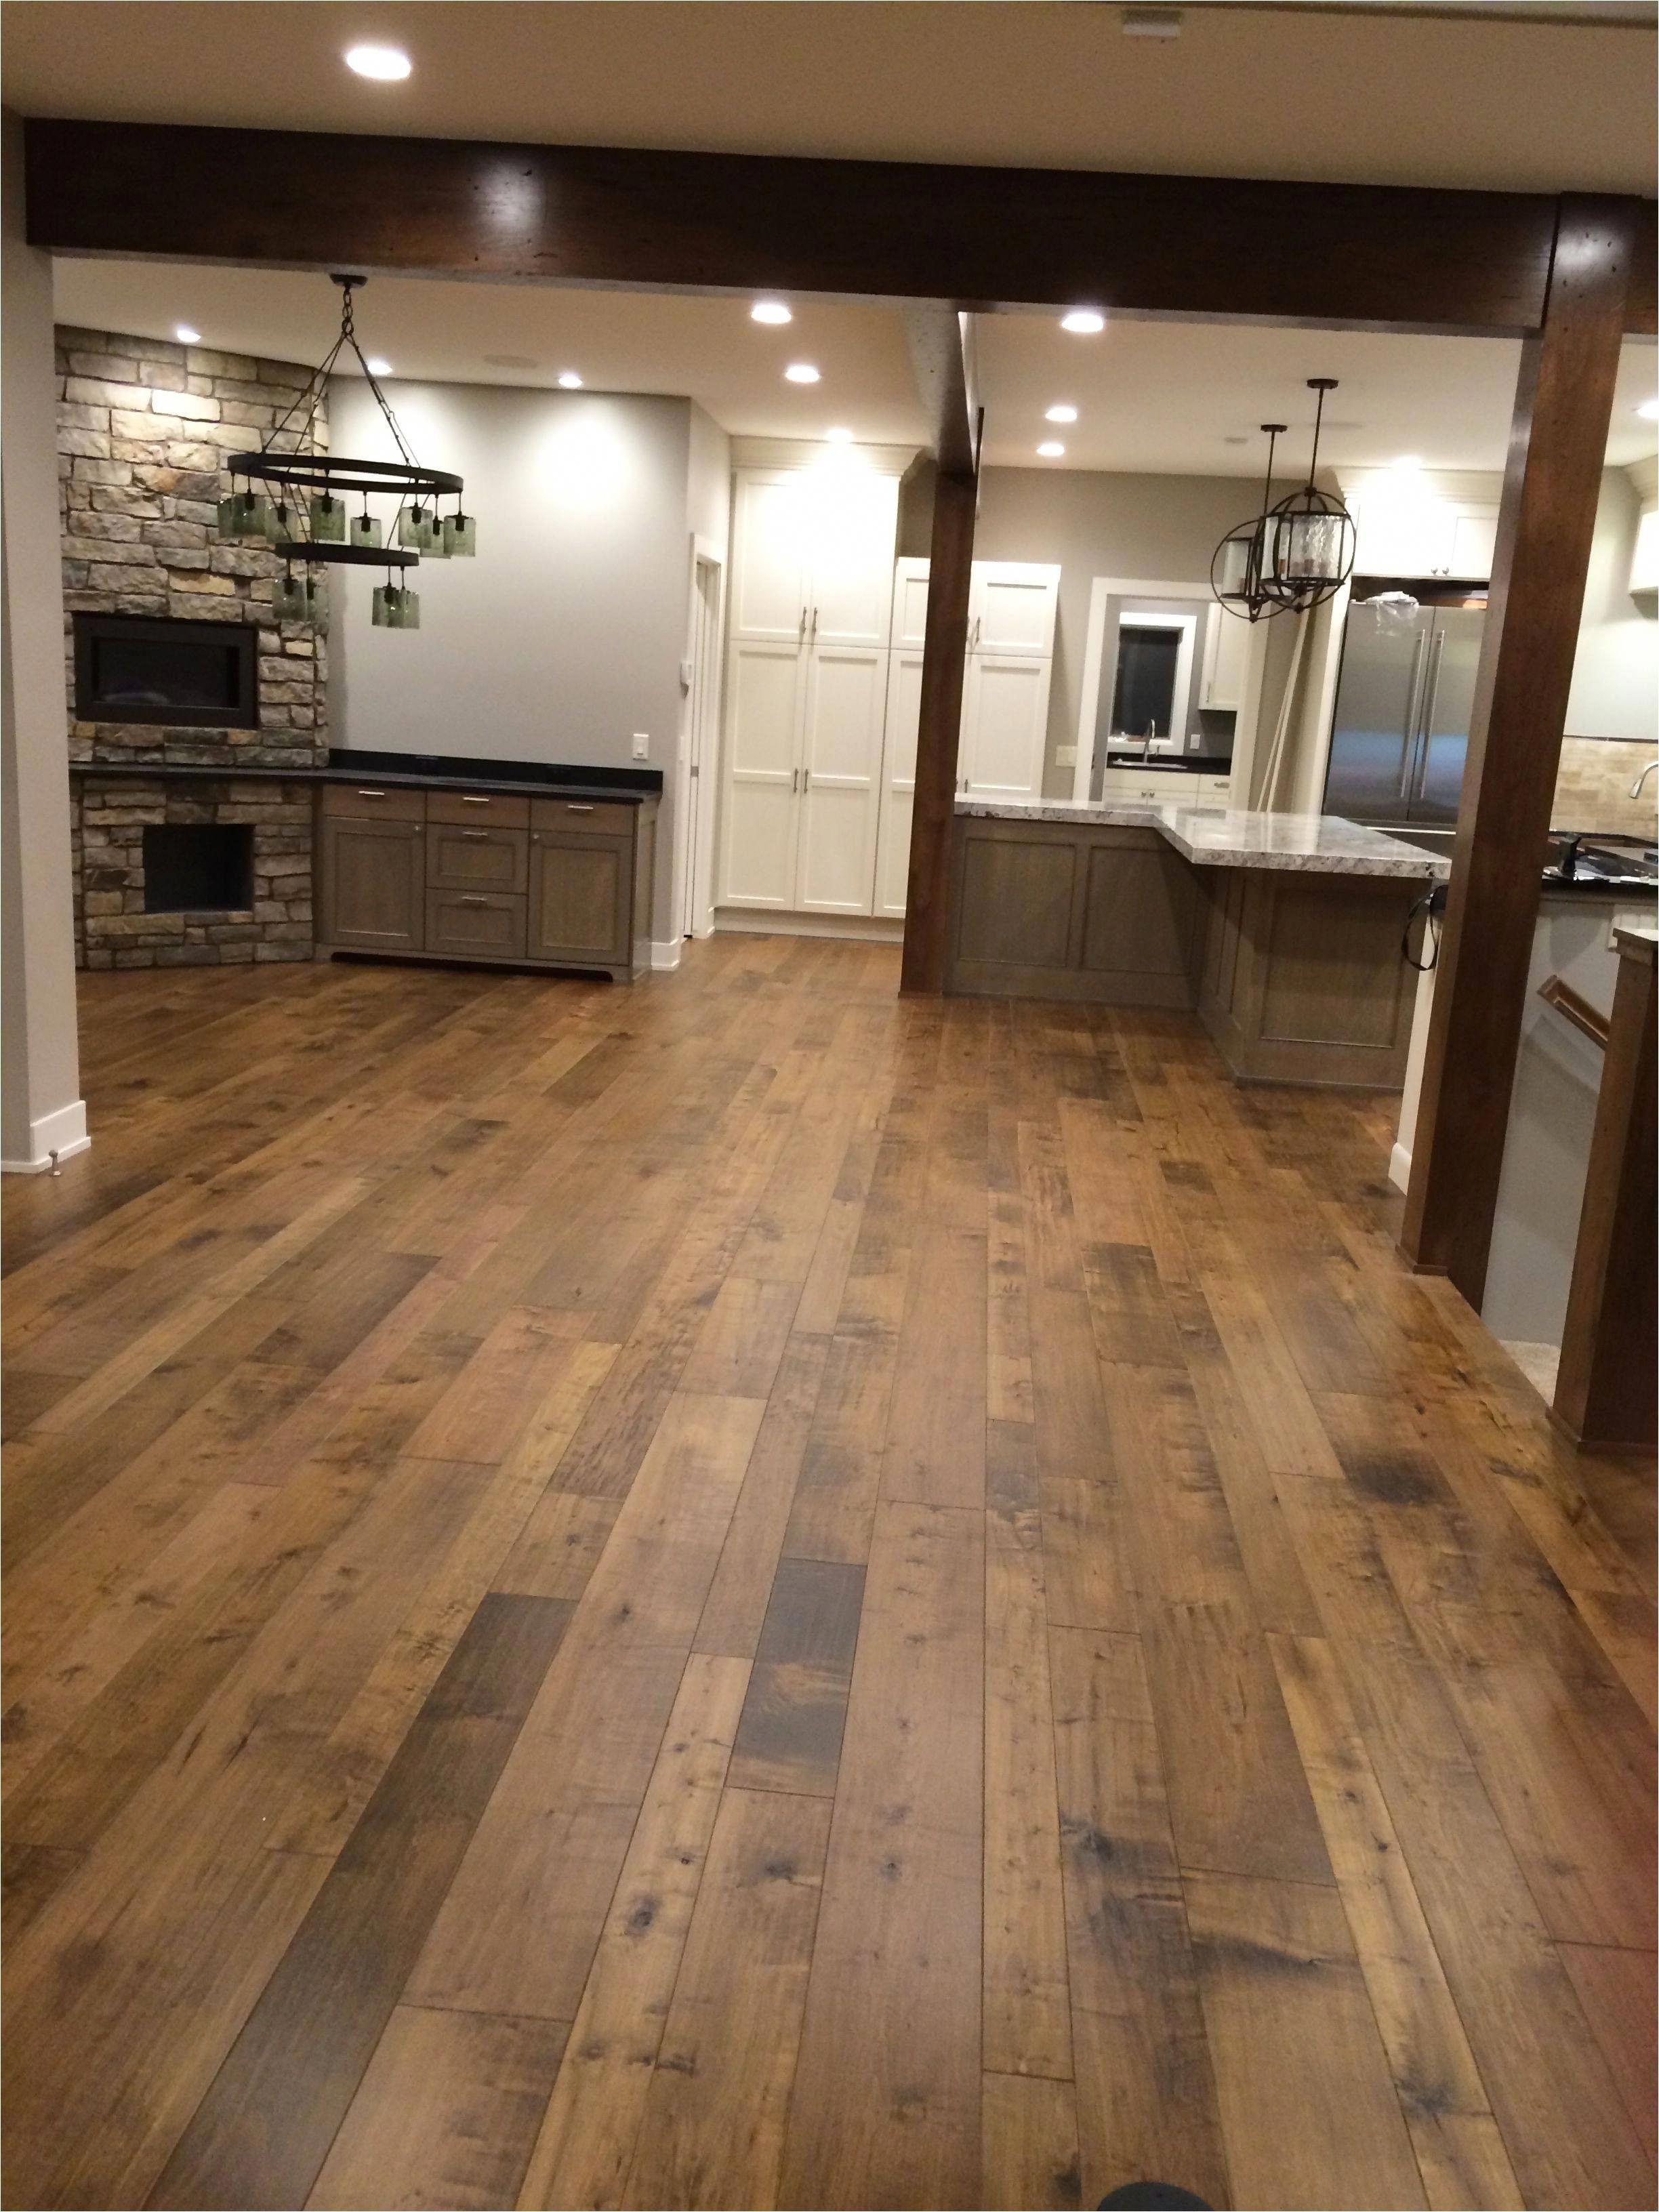 Pin By Kathleen Graham Walsh On Wood Floor In 2020 Rustic Hardwood Floors Wood Floor Colors Hardwood Floor Colors